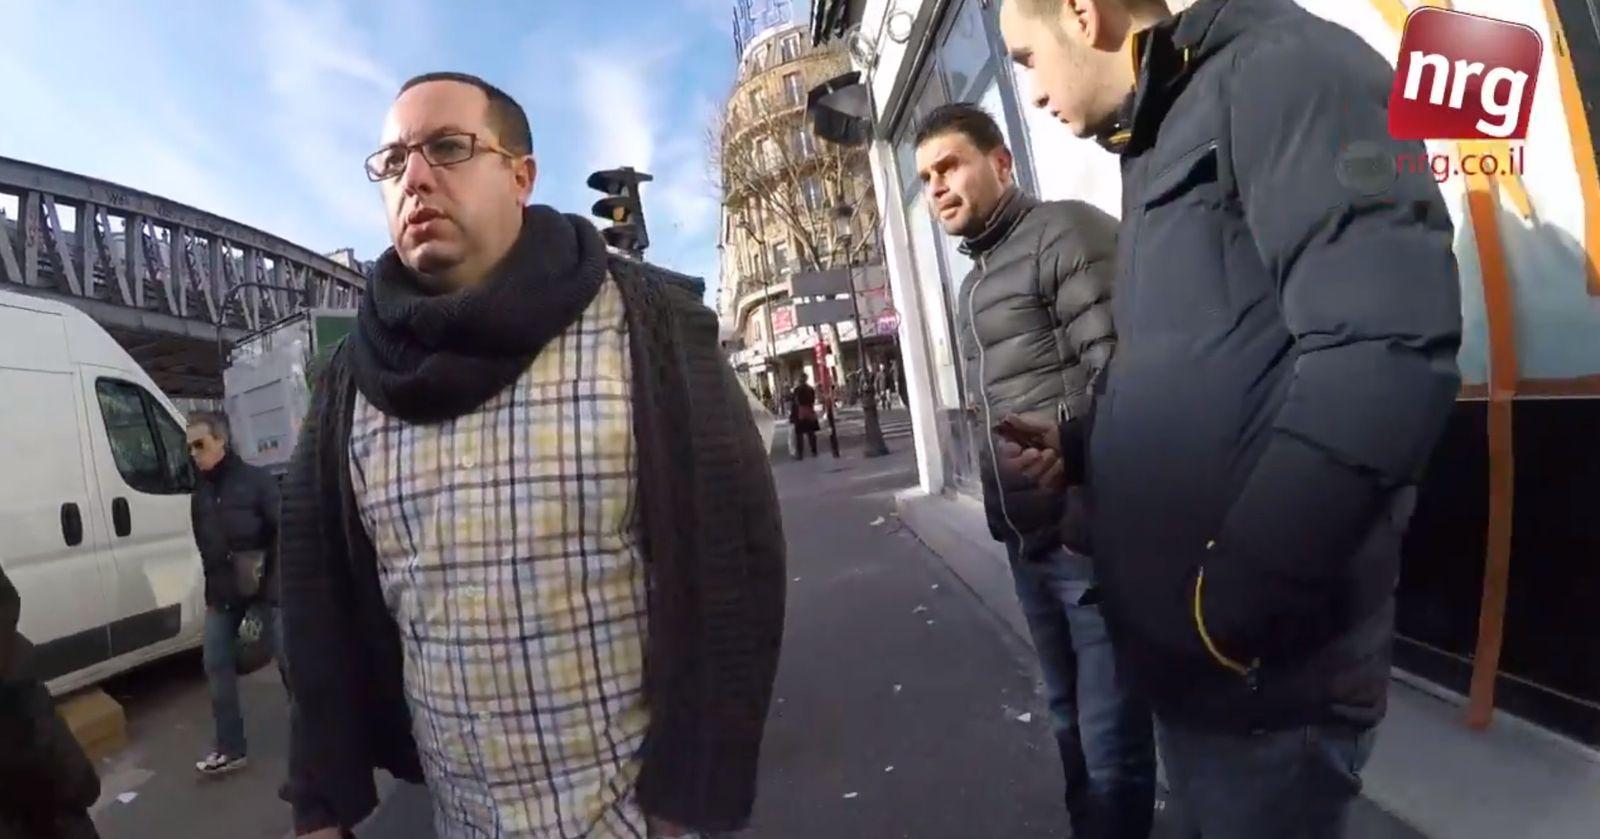 NUR ALS ZITAT Als Jude durch Paris/ Videoexperiment